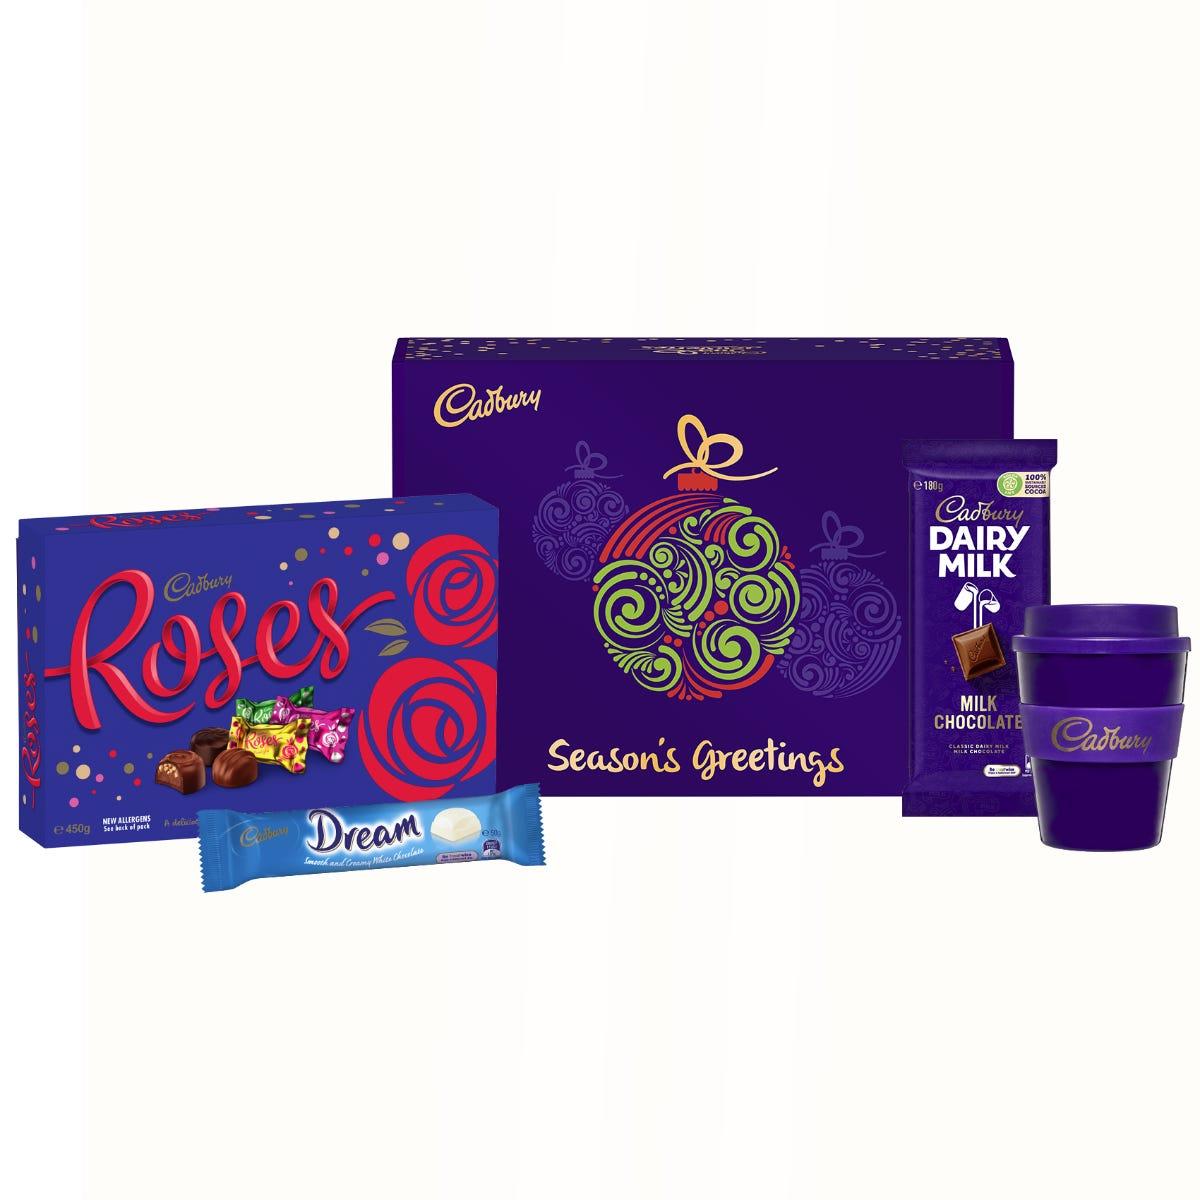 Cadbury Roses gift pack - Season's Greetings